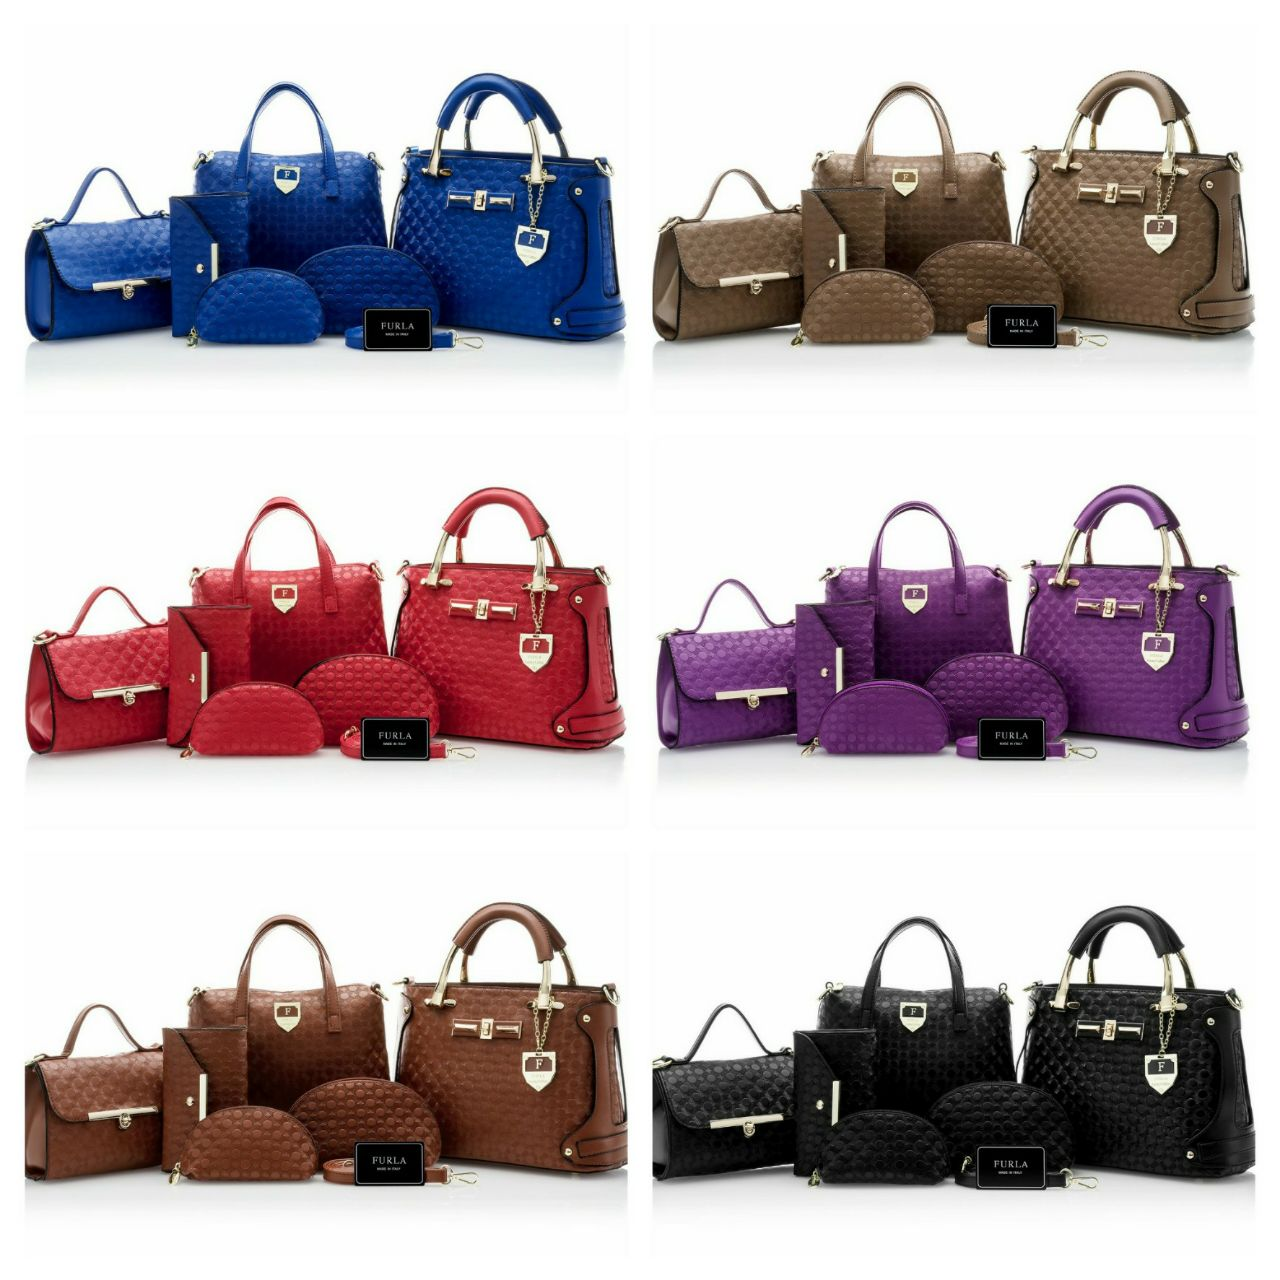 Untuk Pemesan Tas Furla Terbaru harga Murah silakan klick web utama kami  www.tasbatambranded.com fde7f83df9